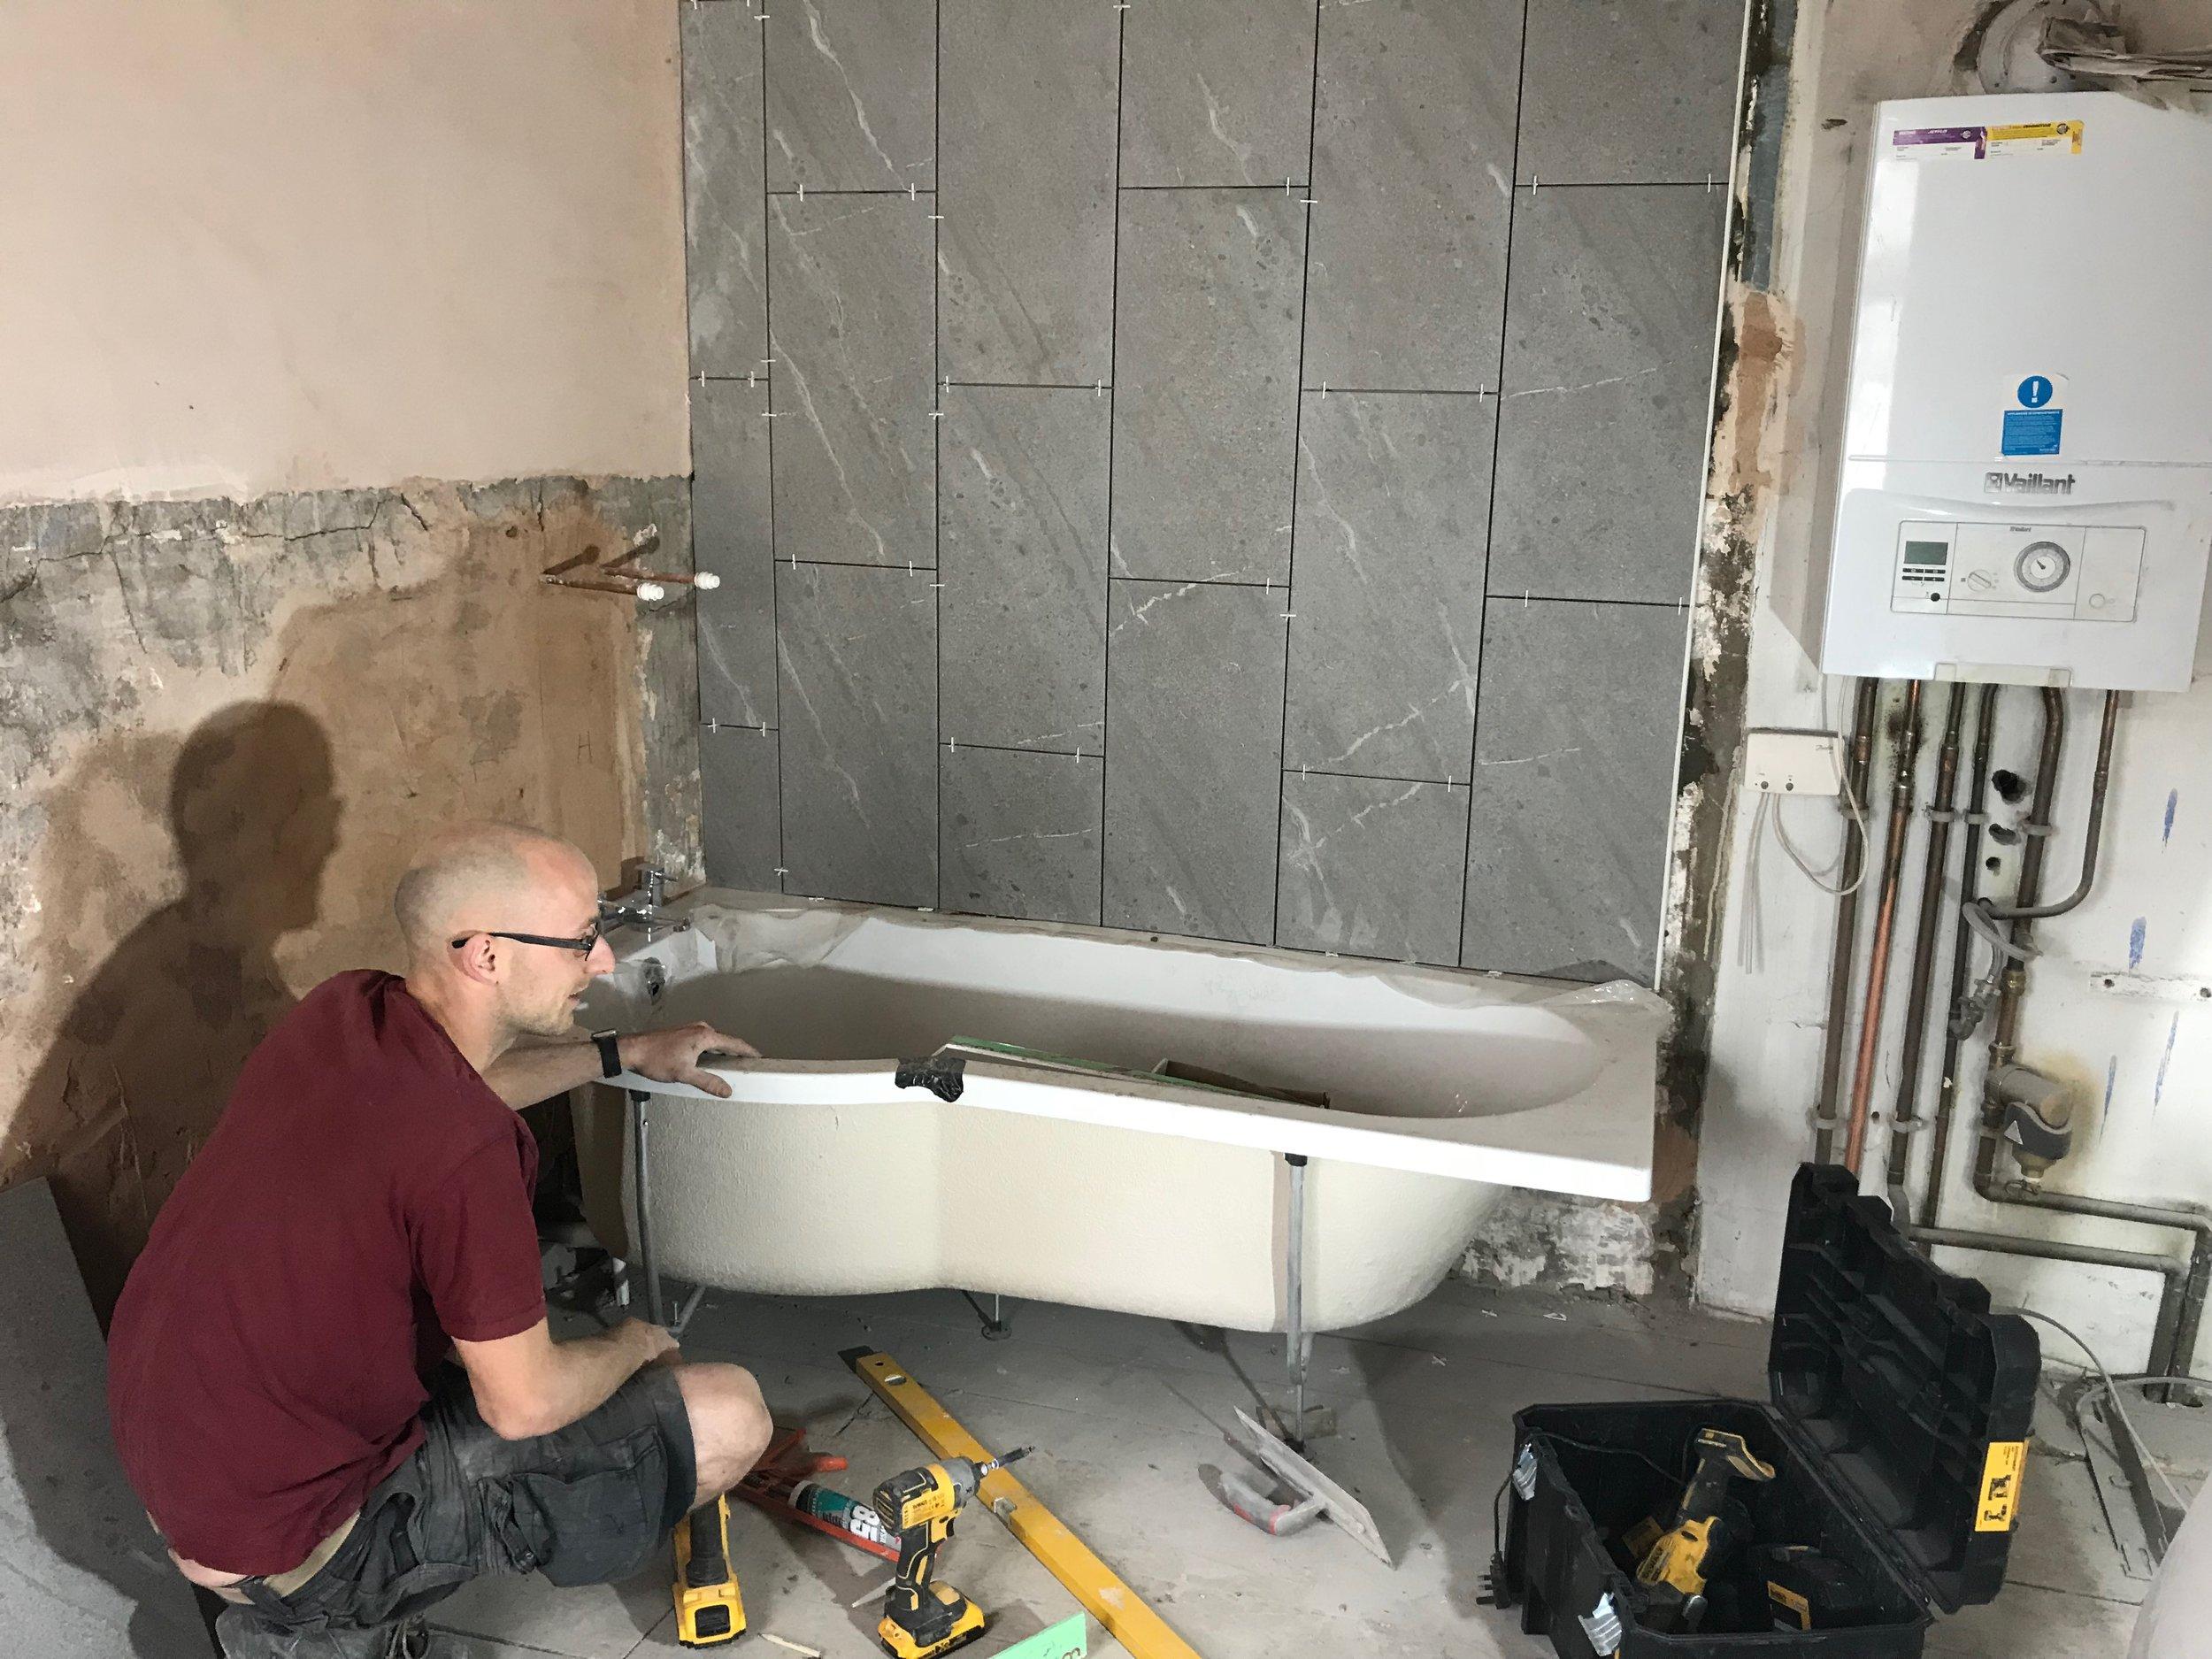 Gareth fitting the P-Bath to a property in Llanelli.